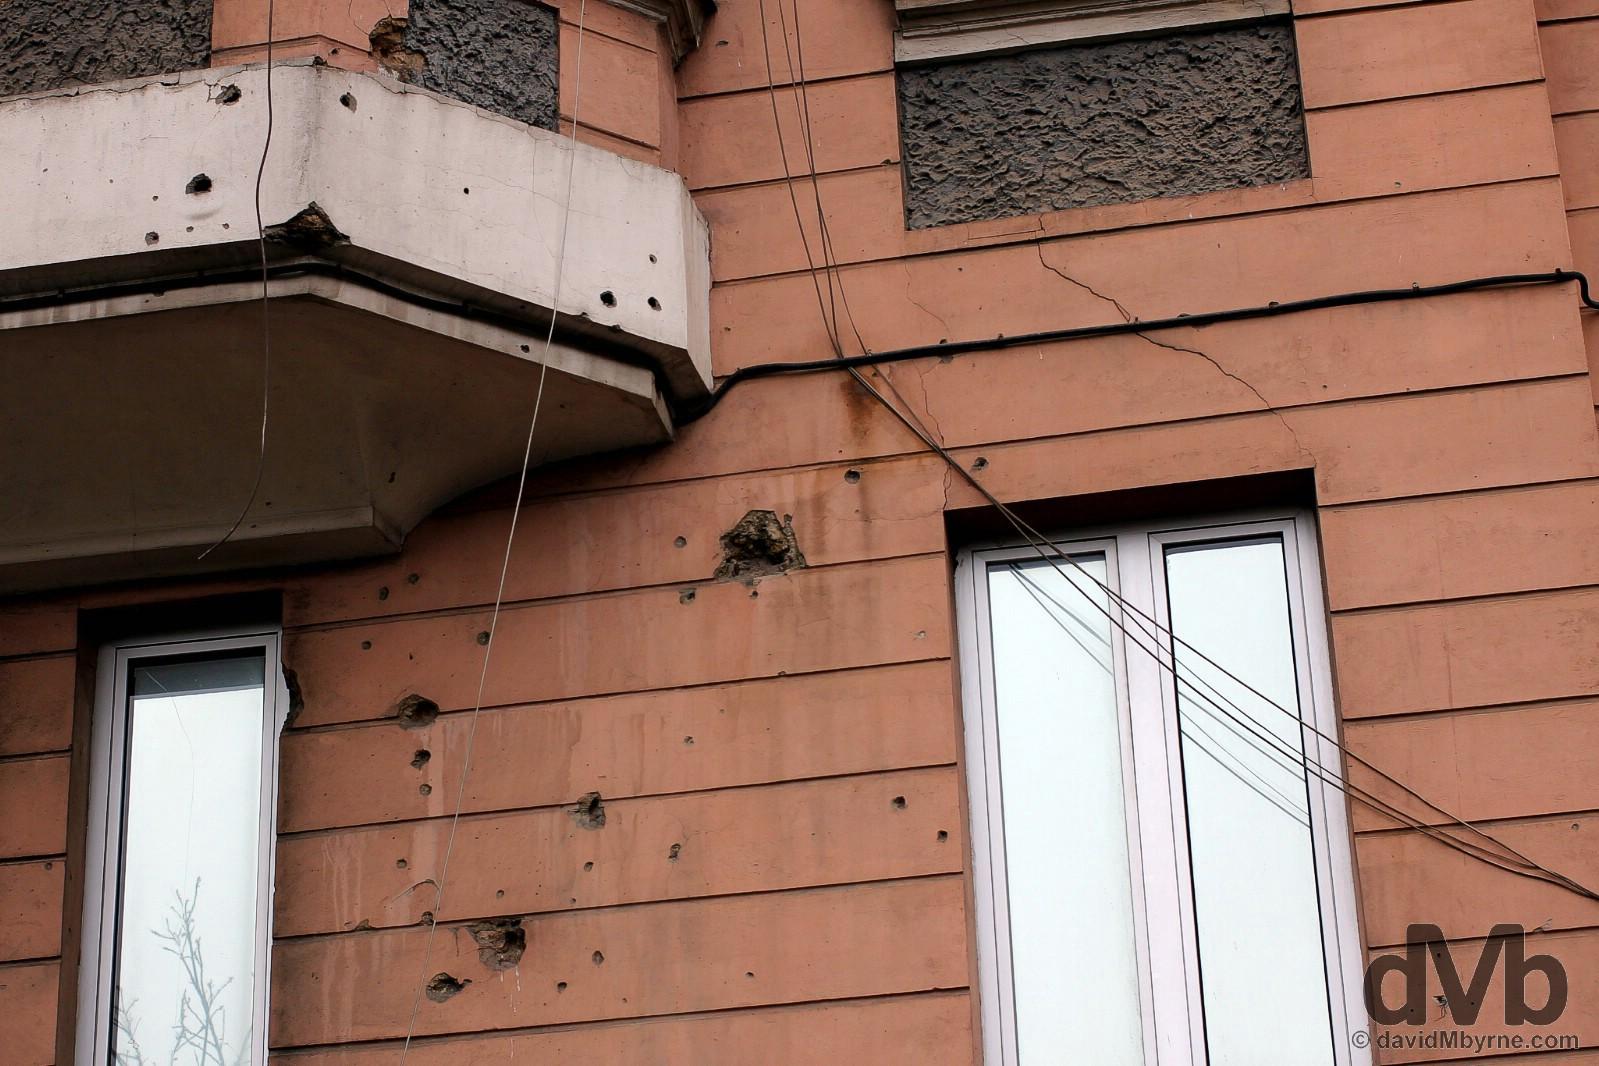 Bosnian War scars on the streets of Sarajevo, Bosnia & Herzegovina. April 5, 2015.